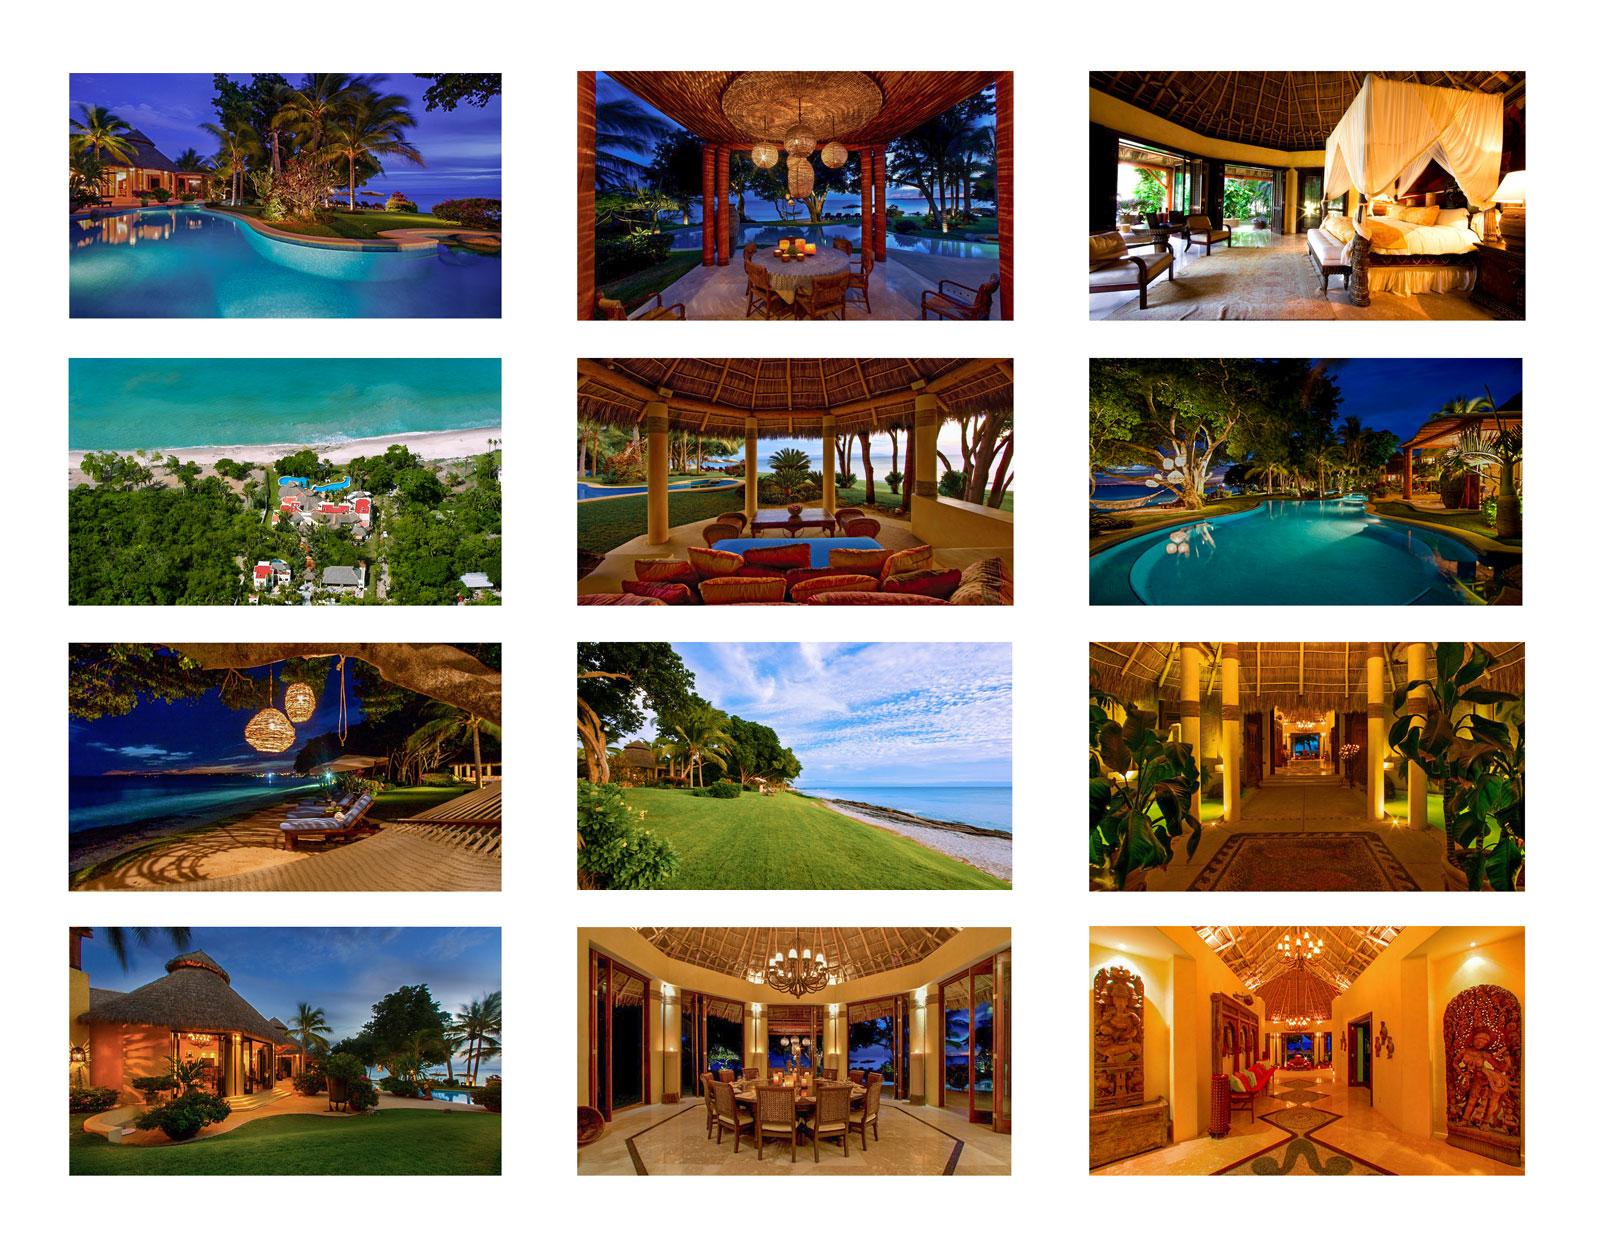 Villa Ranchos 3 - Ultra Luxury Punta Mita Resort, Riviera Nayarit, Mexico